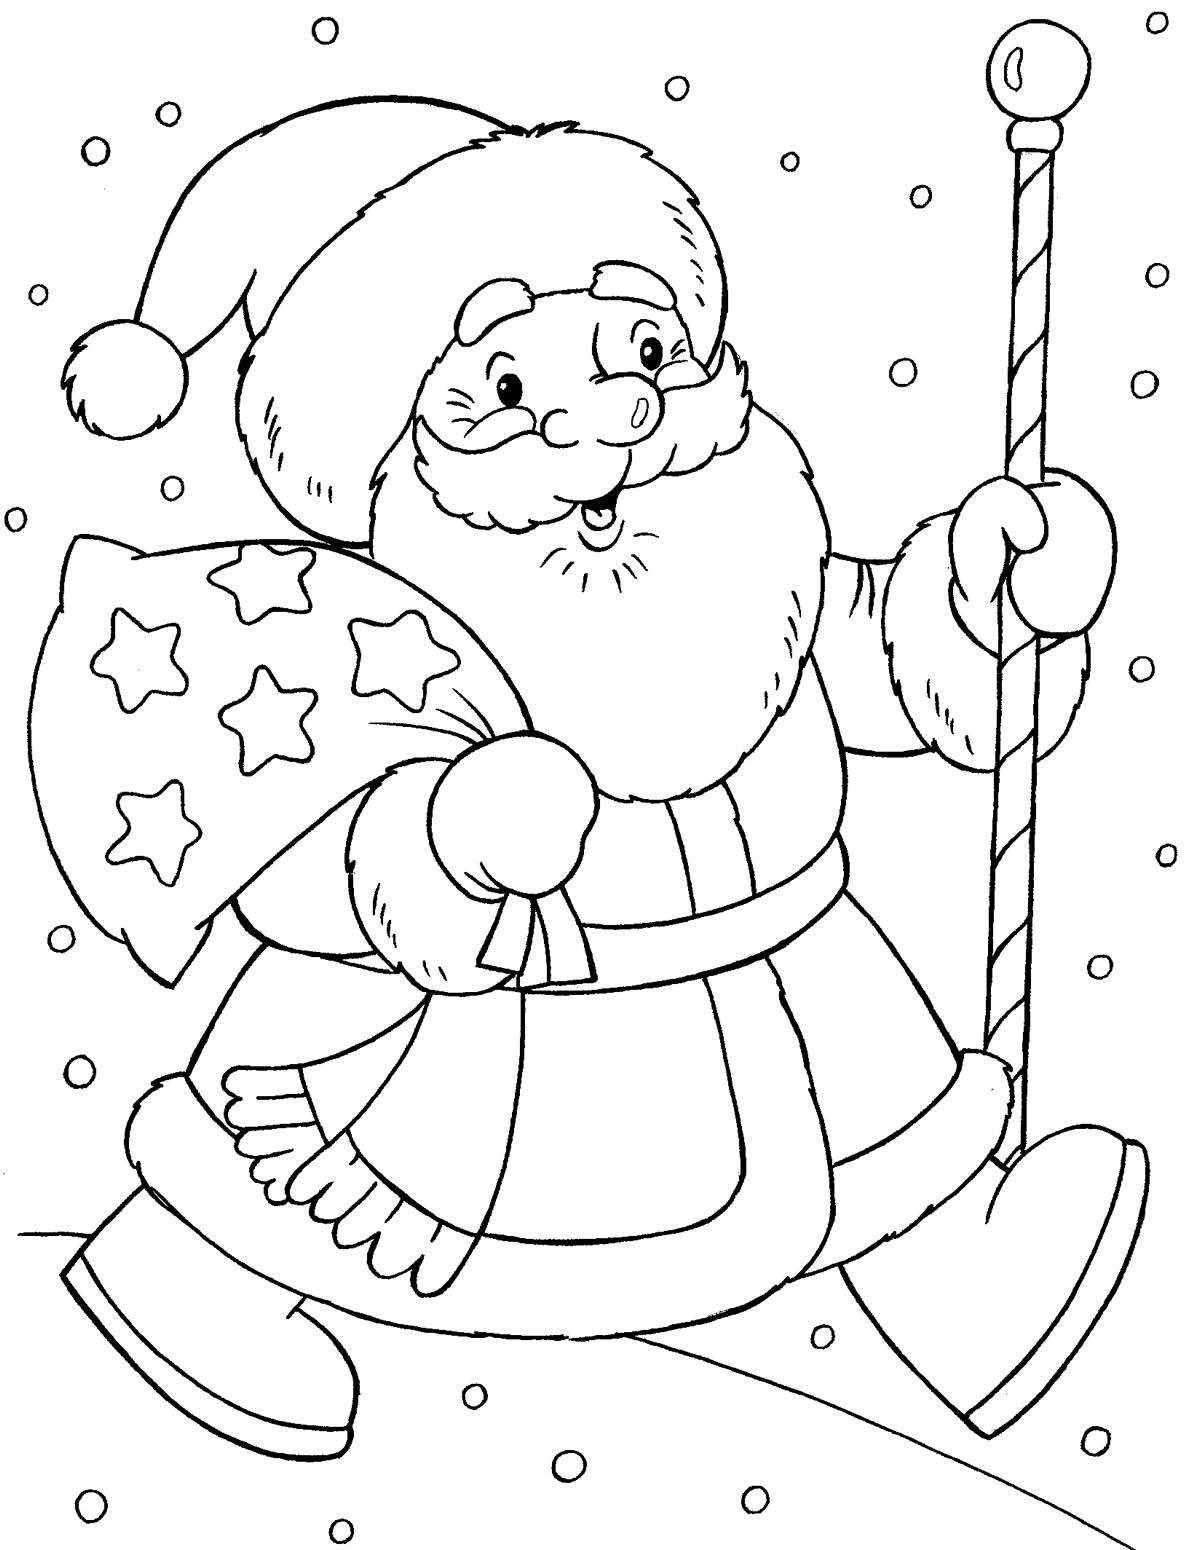 Moldes e desenhos de Papai Noel